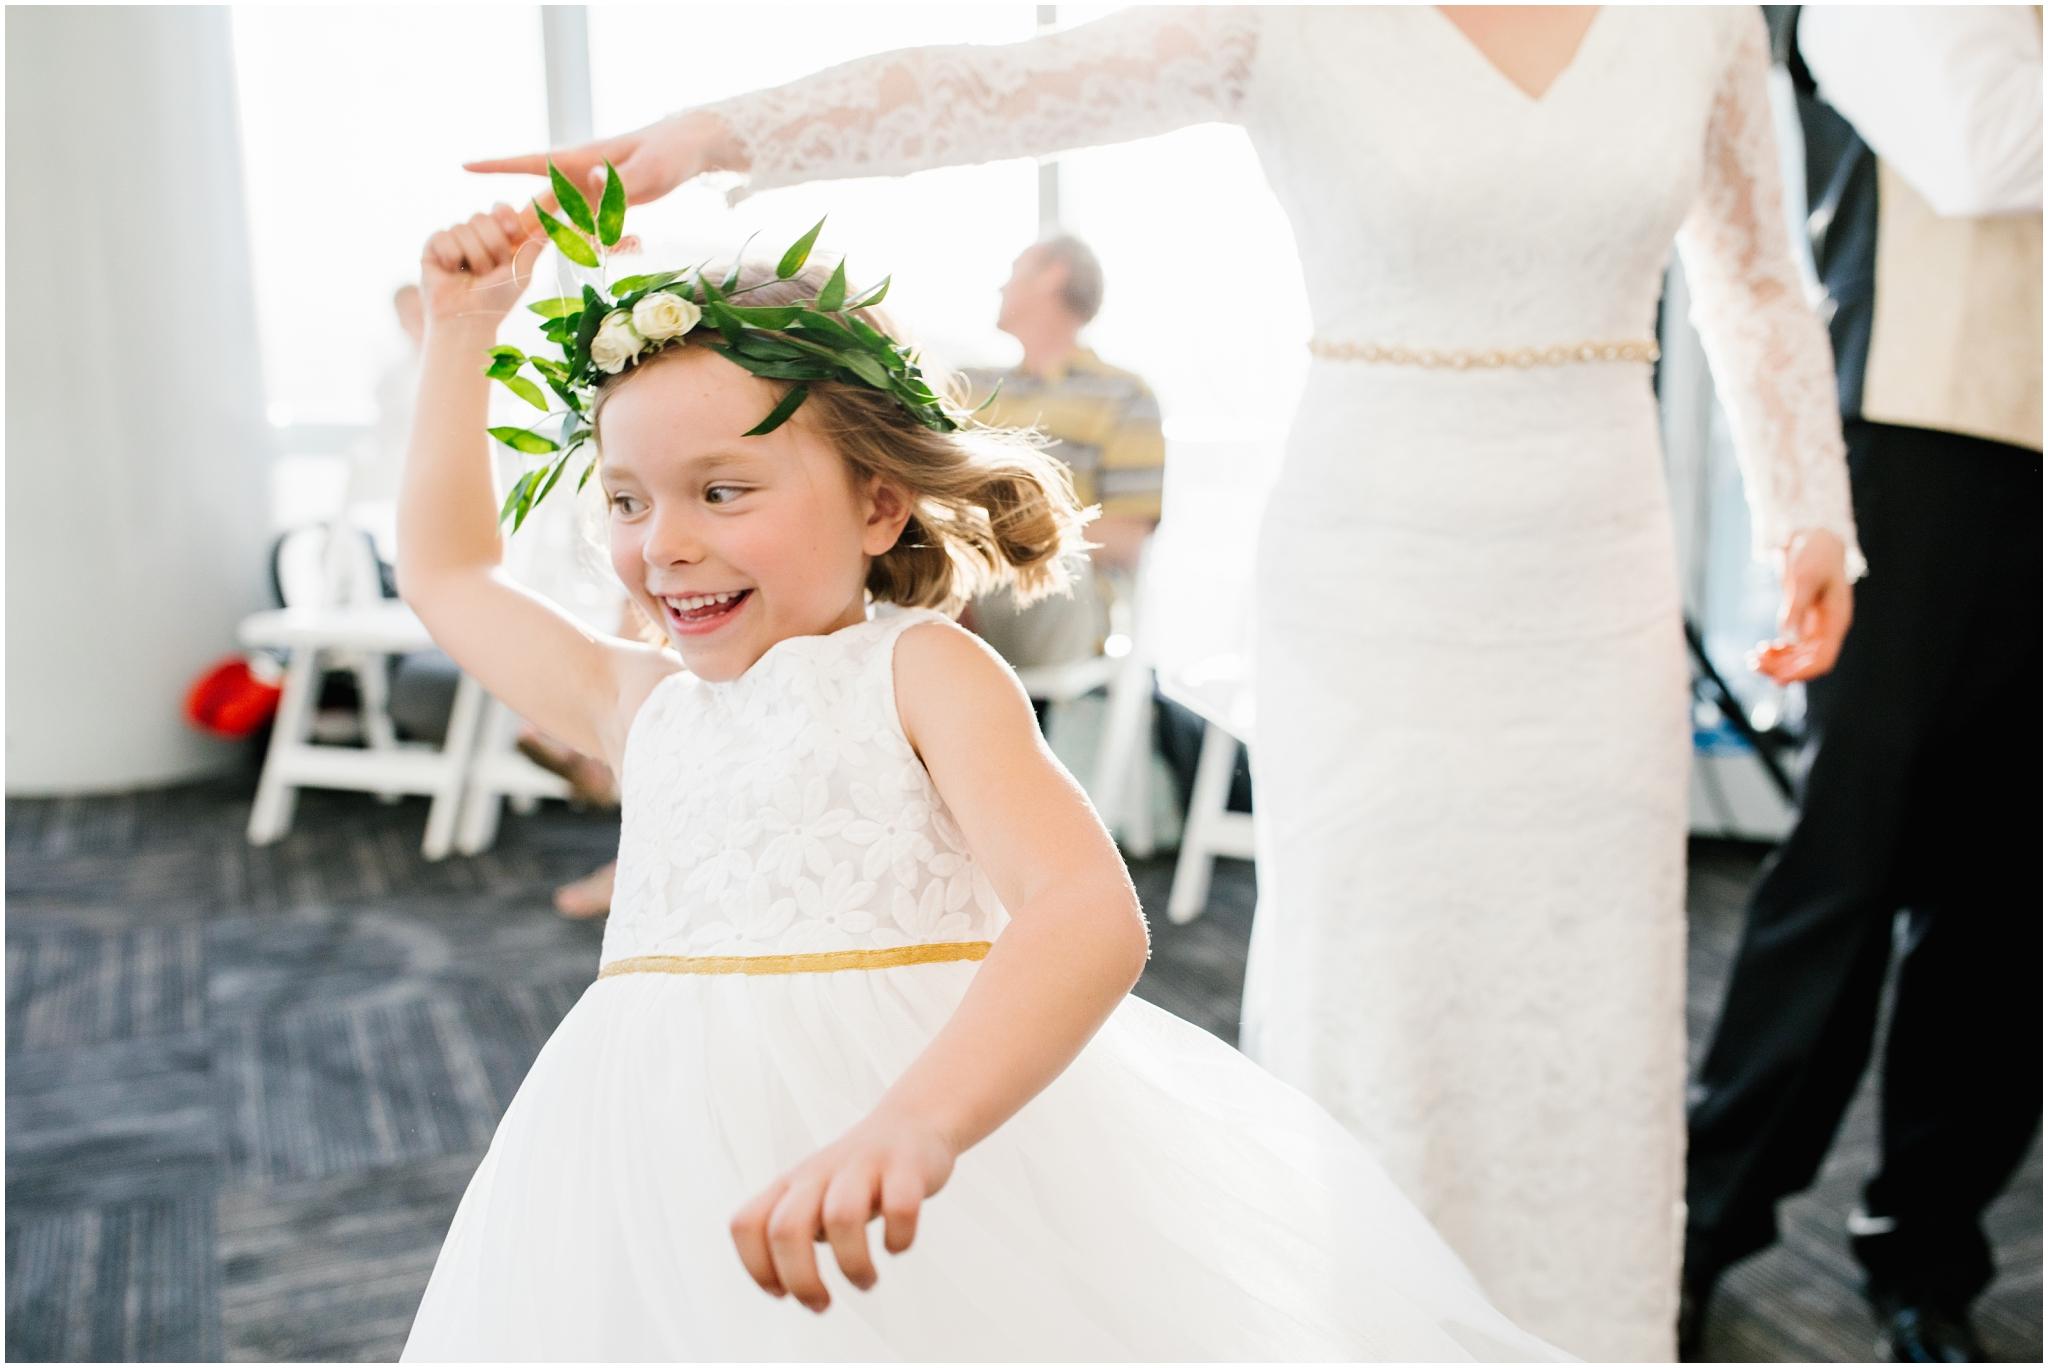 CherylandTyler-576_Lizzie-B-Imagery-Utah-Wedding-Photographer-Salt-Lake-City-Temple-Wells-Fargo-Building-Reception.jpg